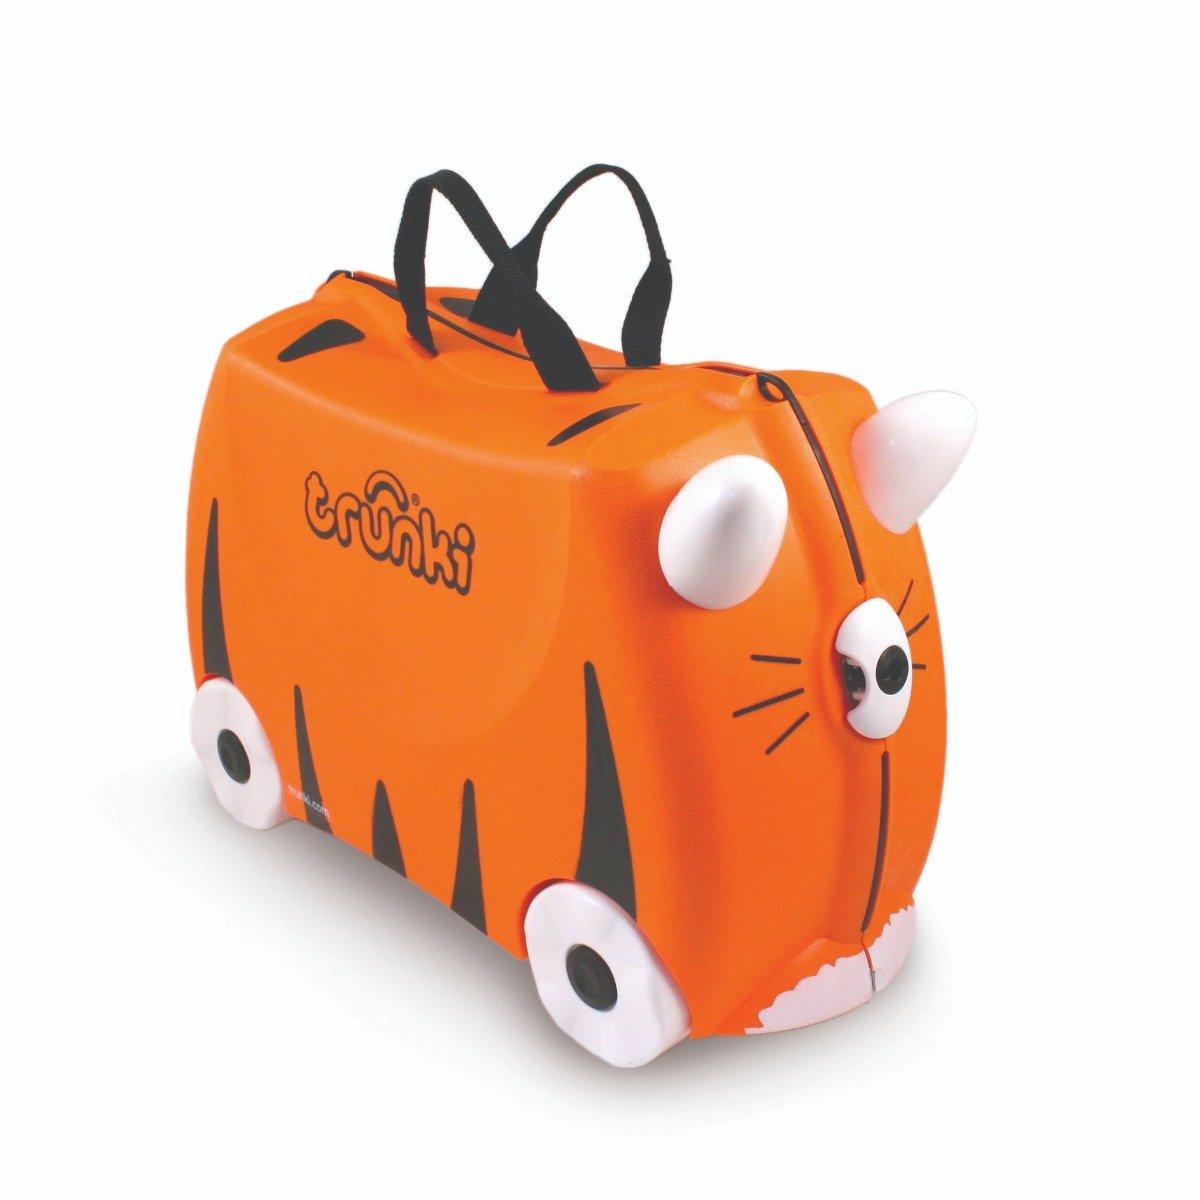 Valiza pentru copii Ride-On Tipu Trunki, Portocaliu, 46 cm imagine